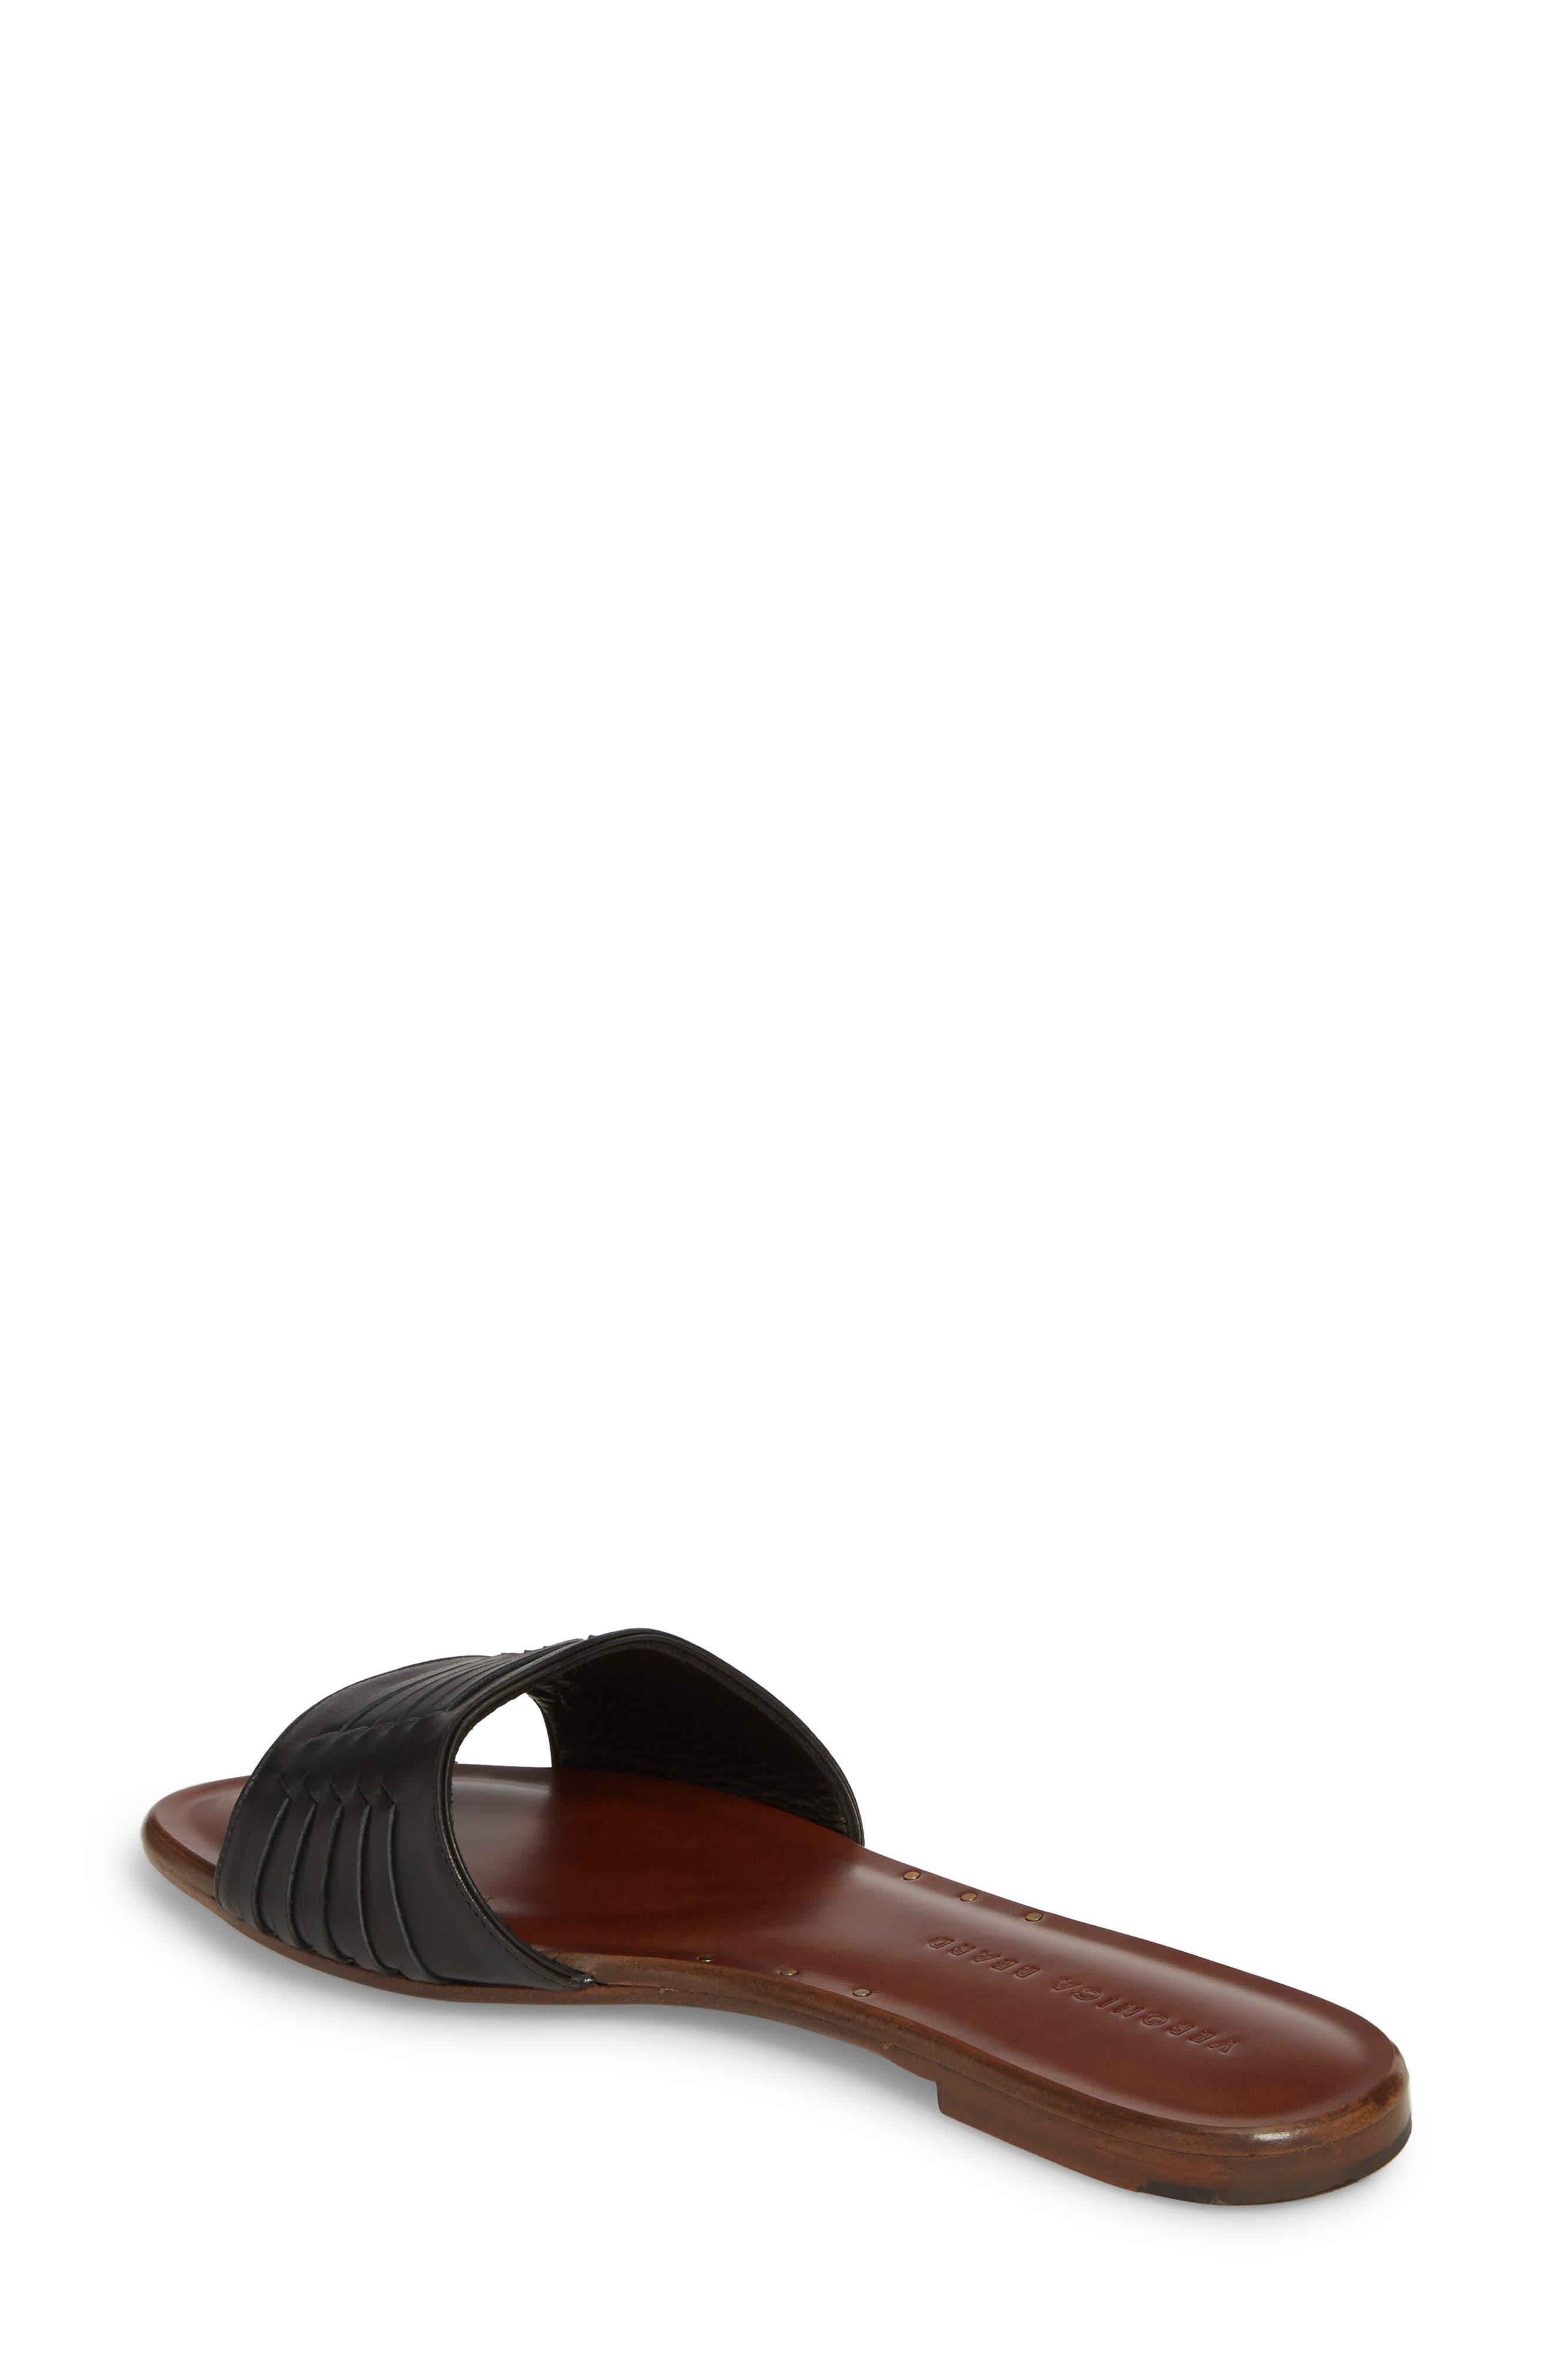 Faven Woven Slide Sandal,                             Alternate thumbnail 2, color,                             001